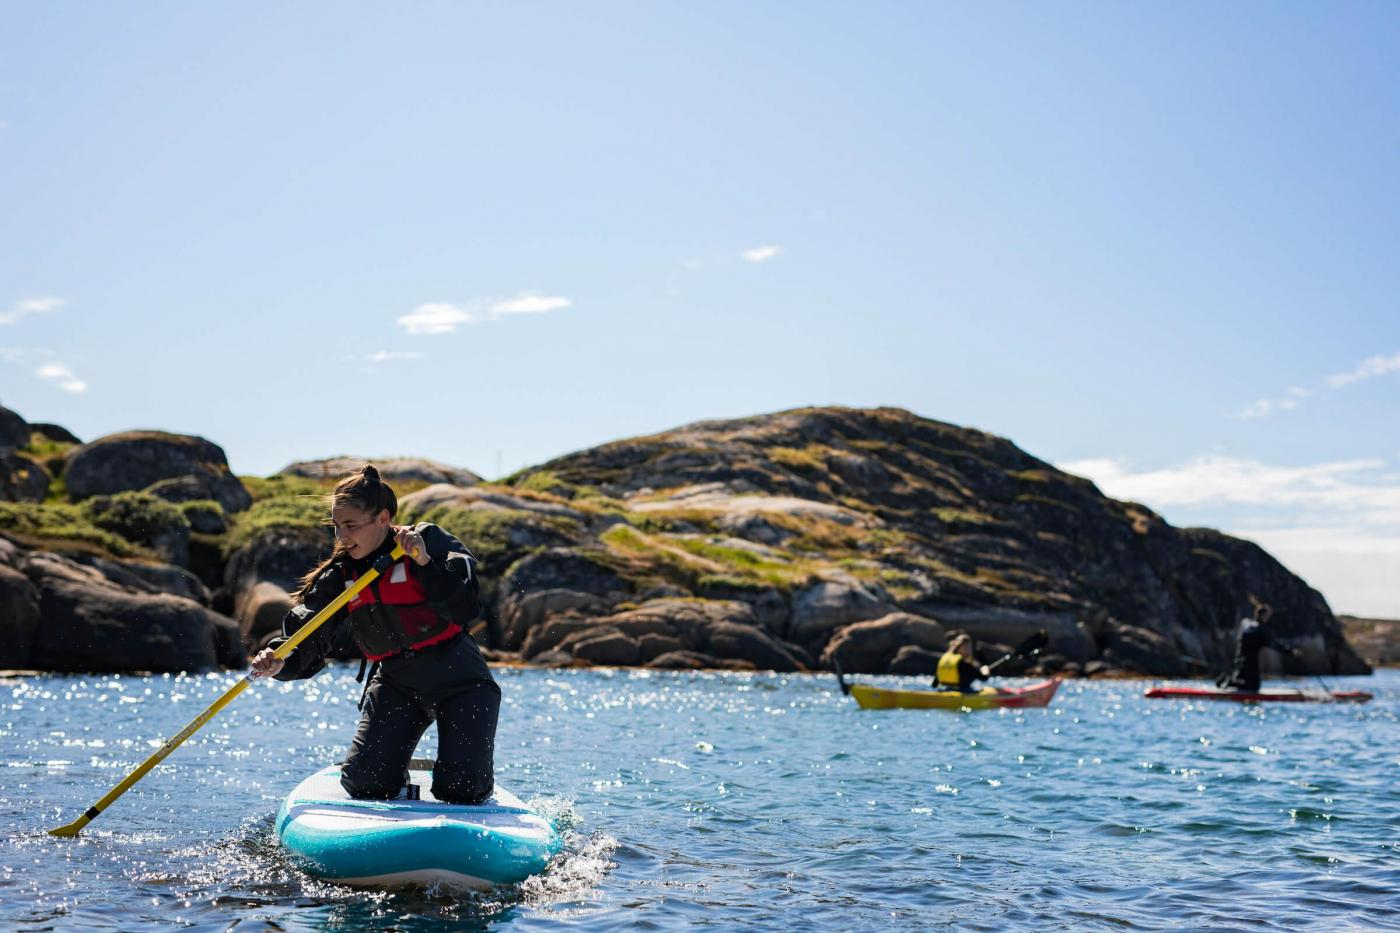 SUP and kayakers in Sisimiut. Photo - Aningaaq R. Carlsen, Visit Greenland